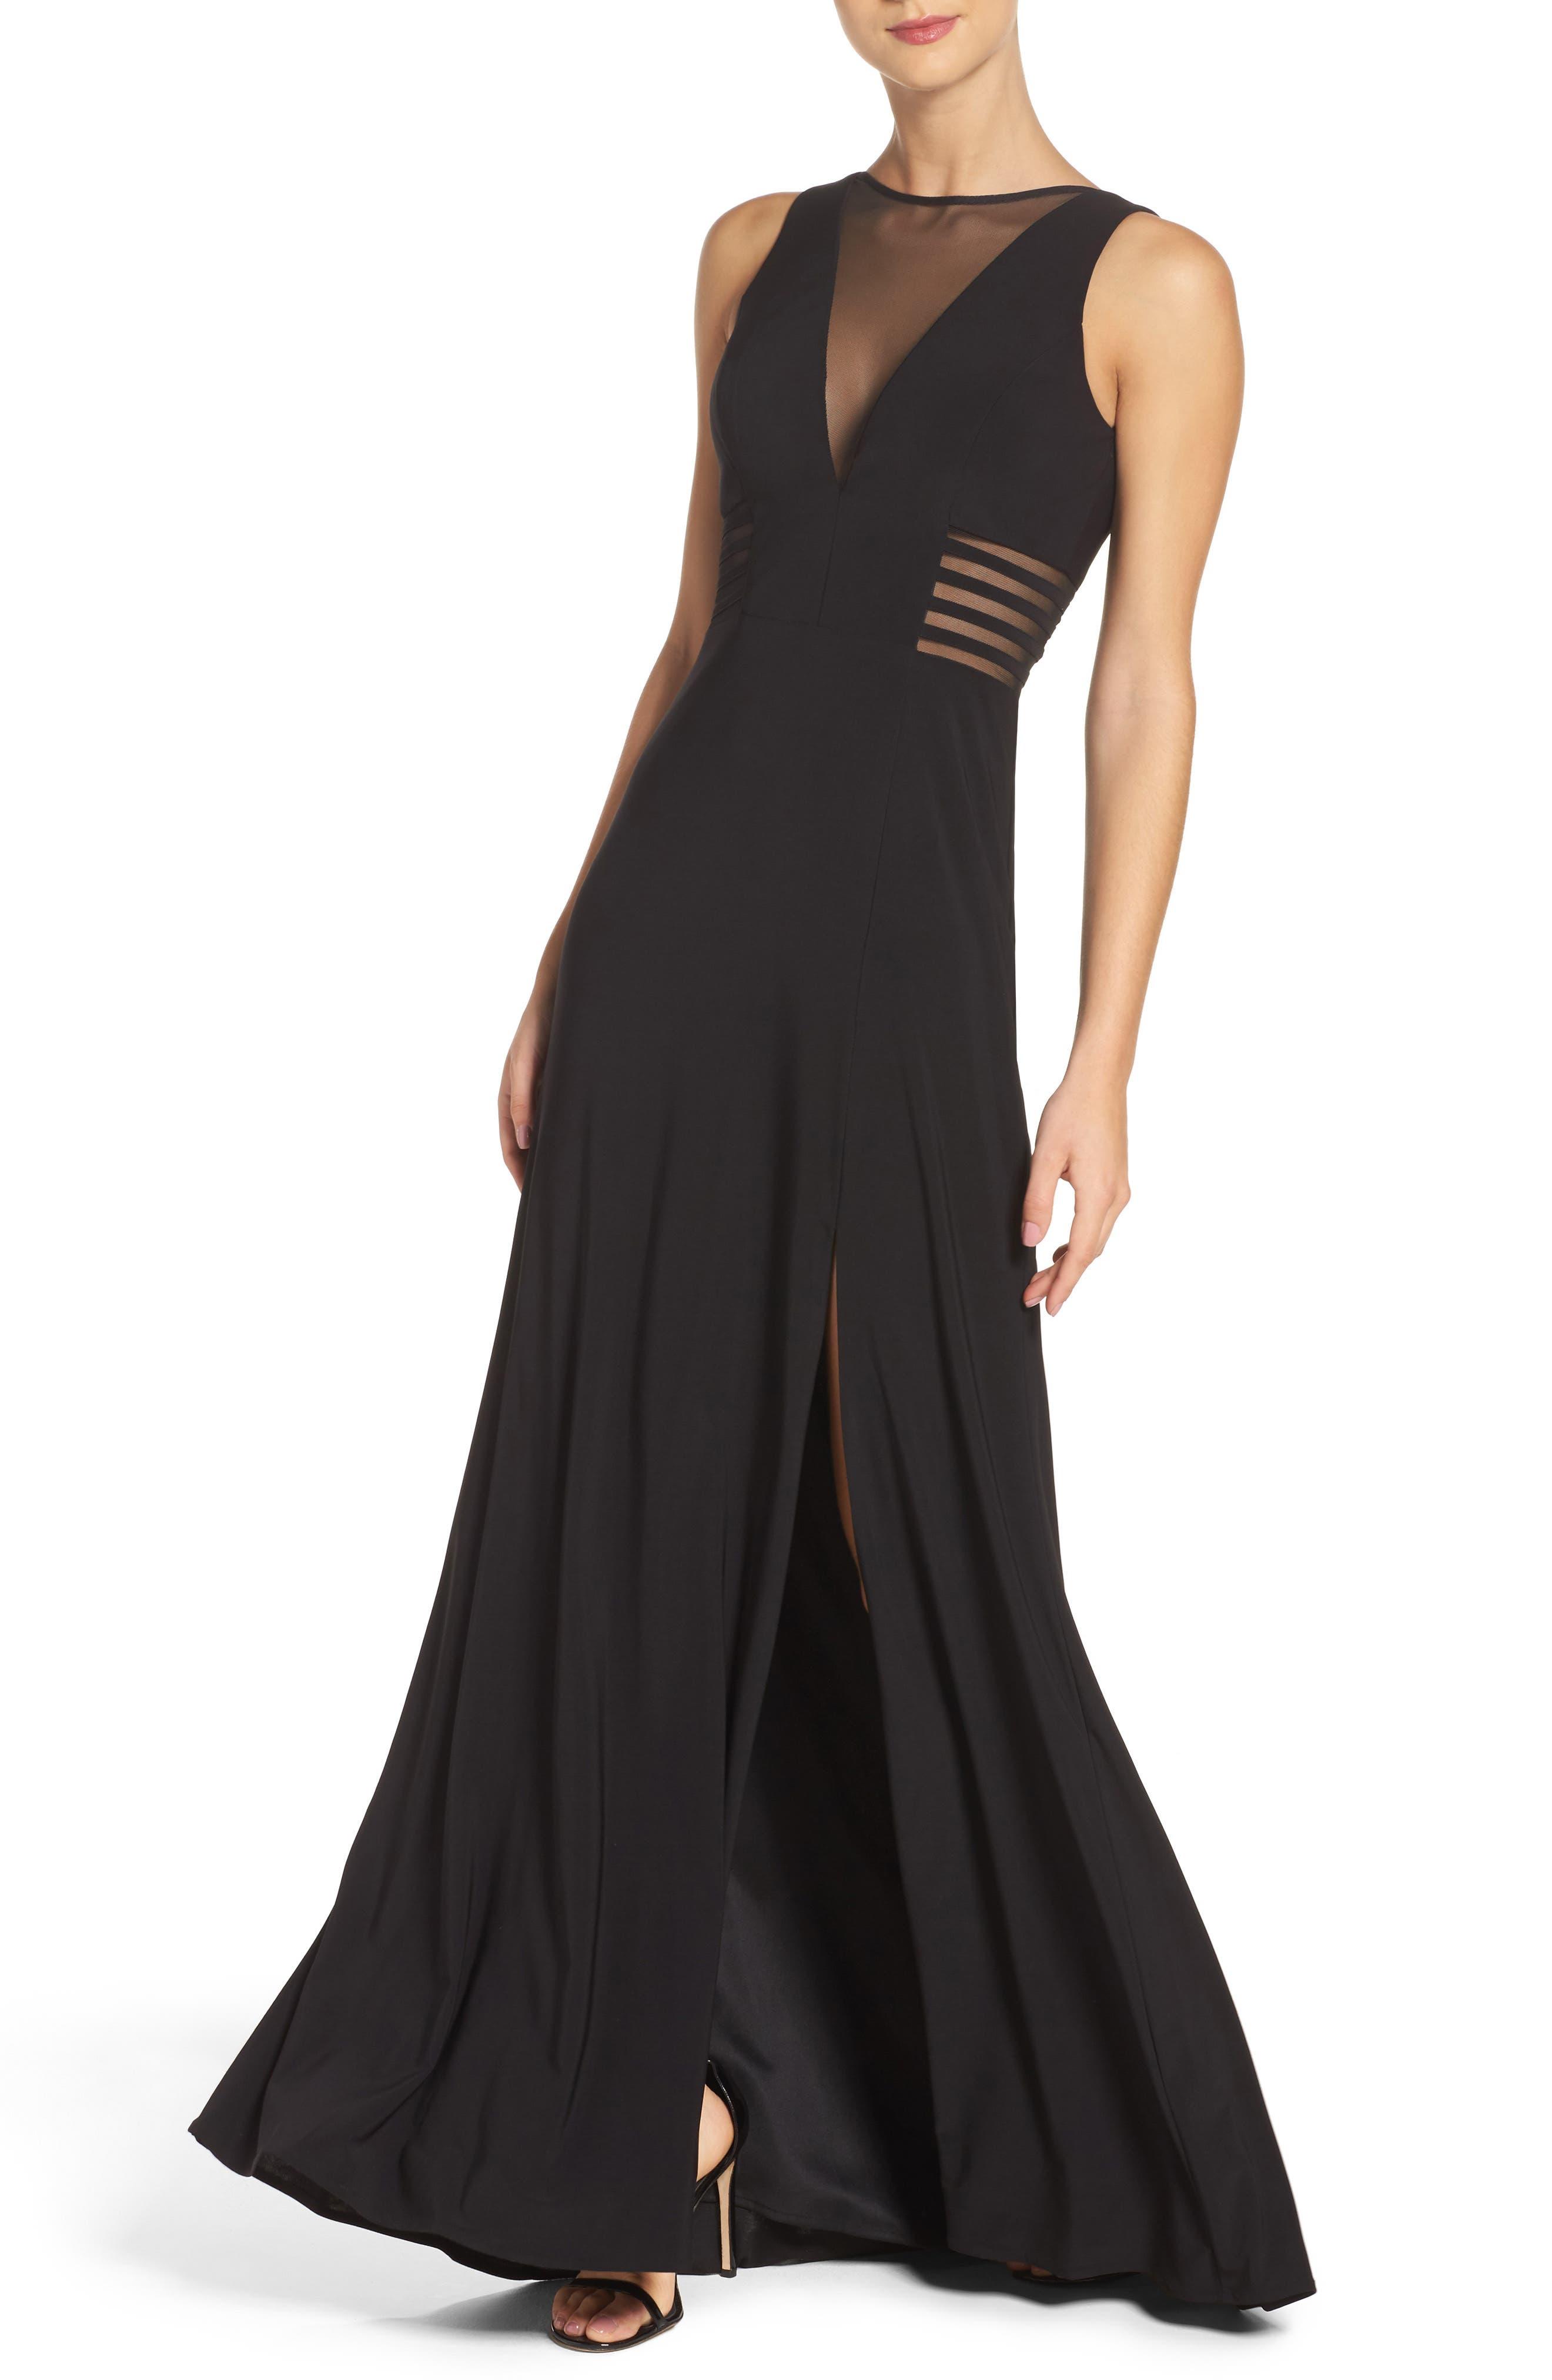 MORGAN & CO., Illusion Gown, Alternate thumbnail 5, color, BLACK